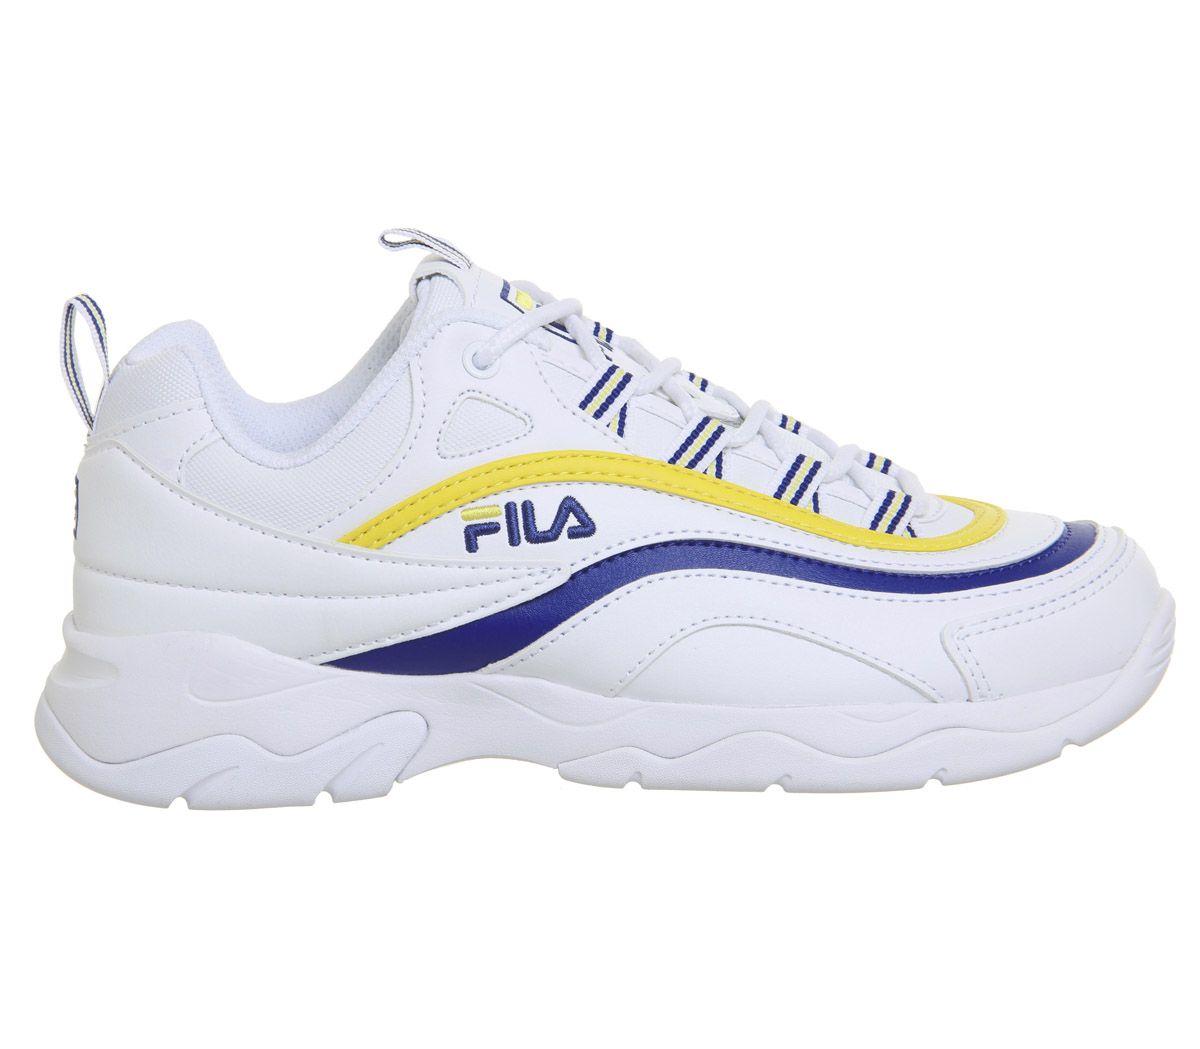 843c9a0f7 Fila Fila Ray Trainers White Mazarine Blue Lemon - Hers trainers